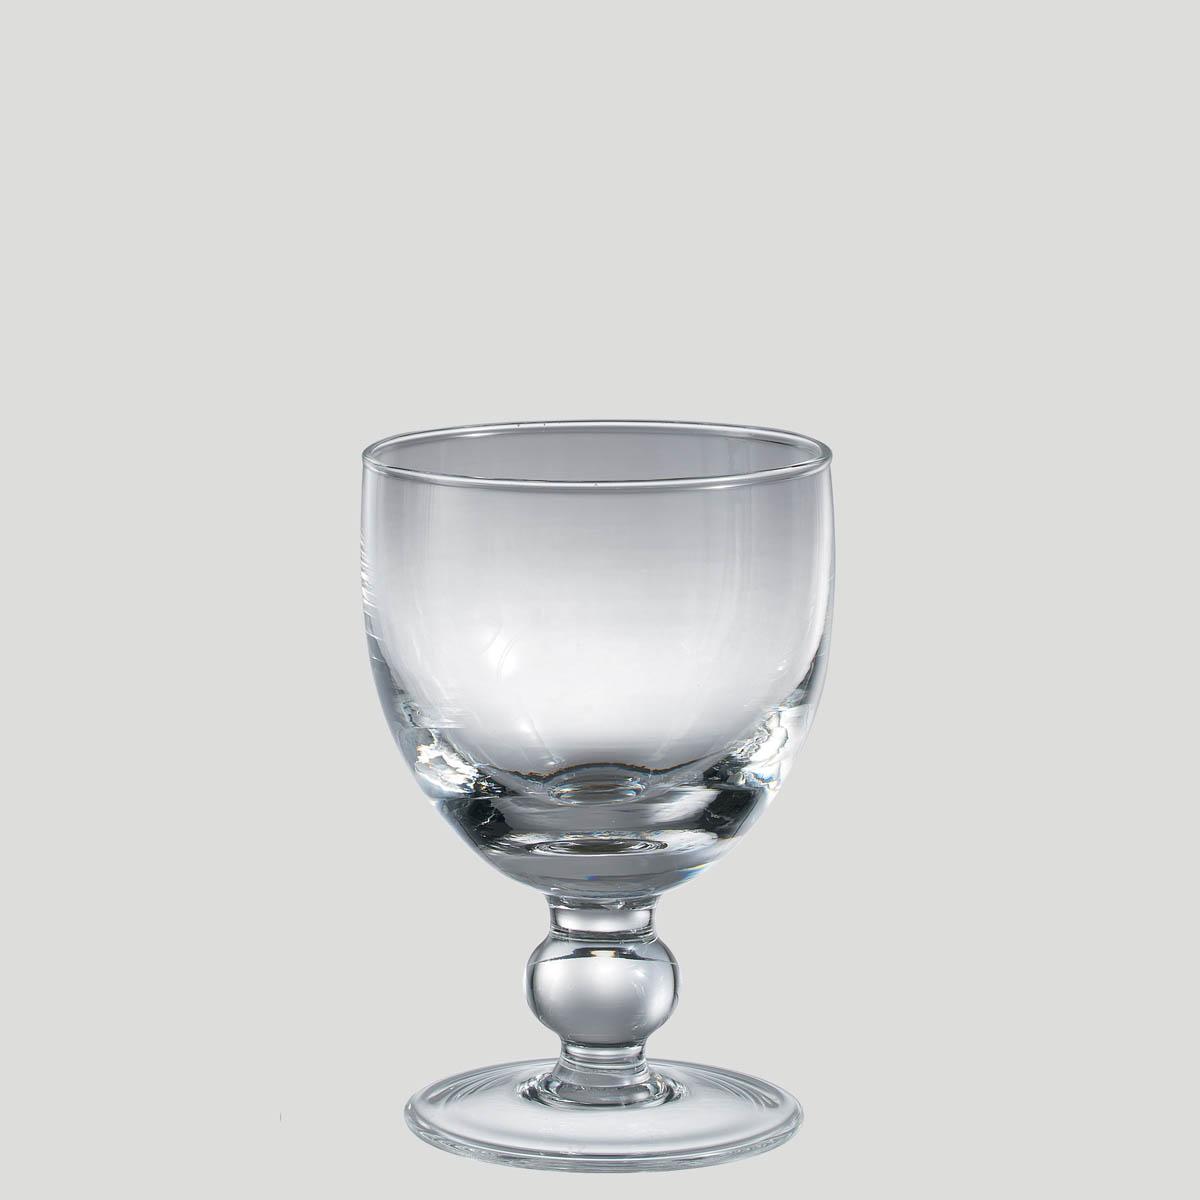 Lido - Coppe per gelato in vetro - Gardagel